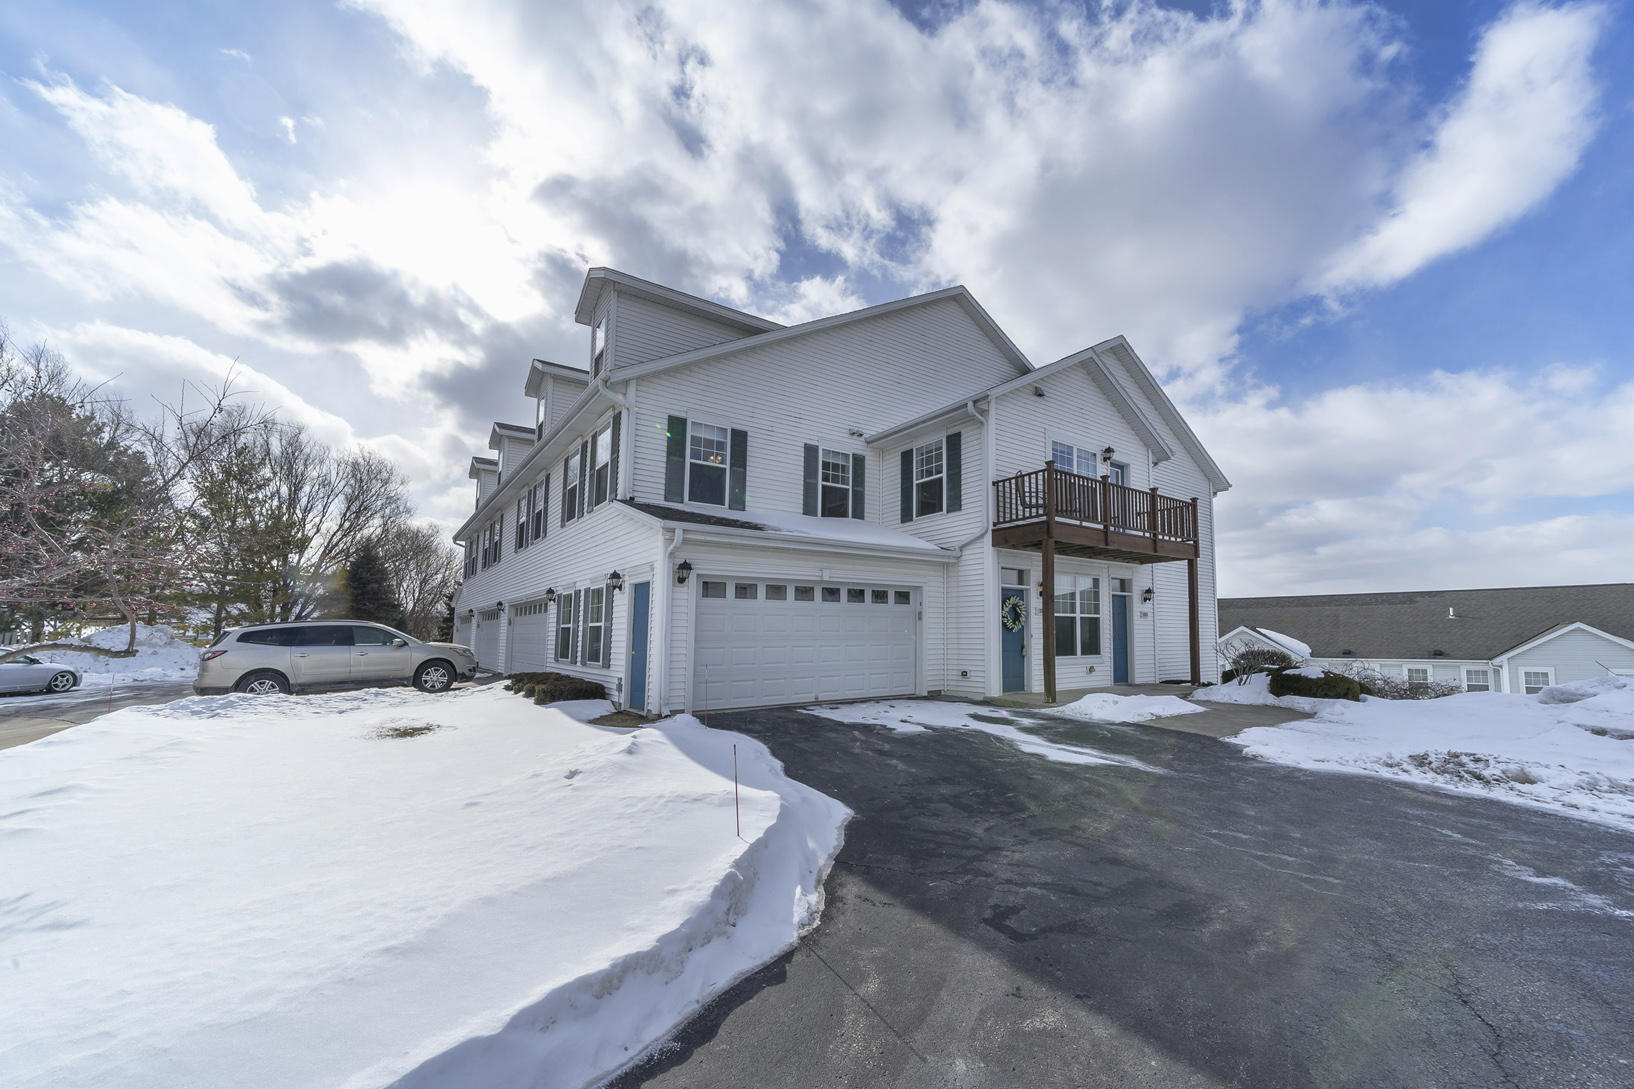 1201 Woodbury Commons, Waukesha, Wisconsin 53189, 3 Bedrooms Bedrooms, 5 Rooms Rooms,2 BathroomsBathrooms,Condominiums,For Sale,Woodbury Commons,2,1624916